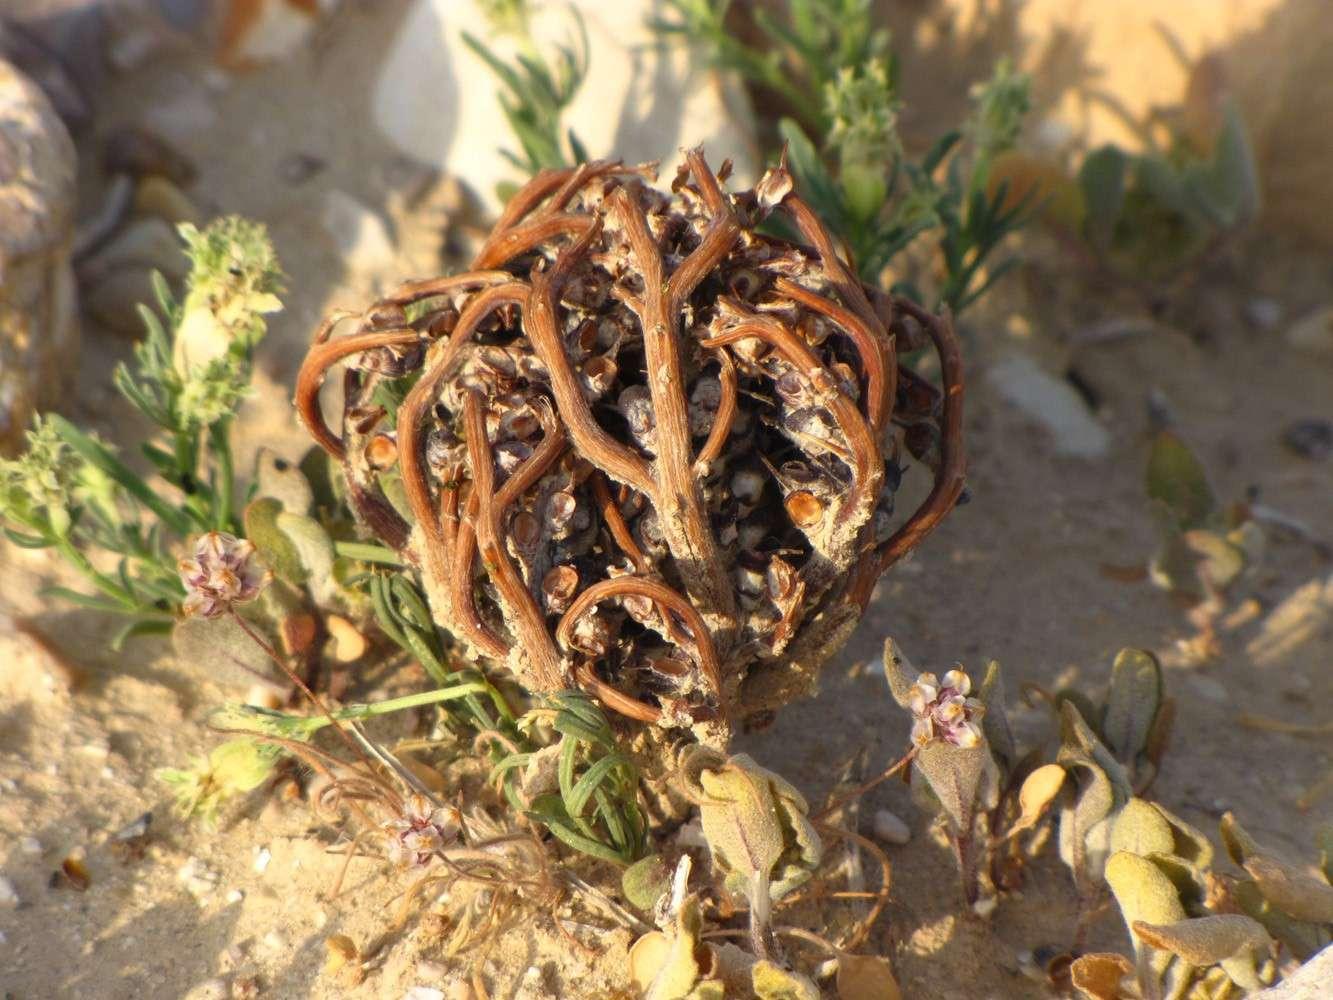 Уход за селагинеллой чешуелистной дома: почва, подкормка и другие условия